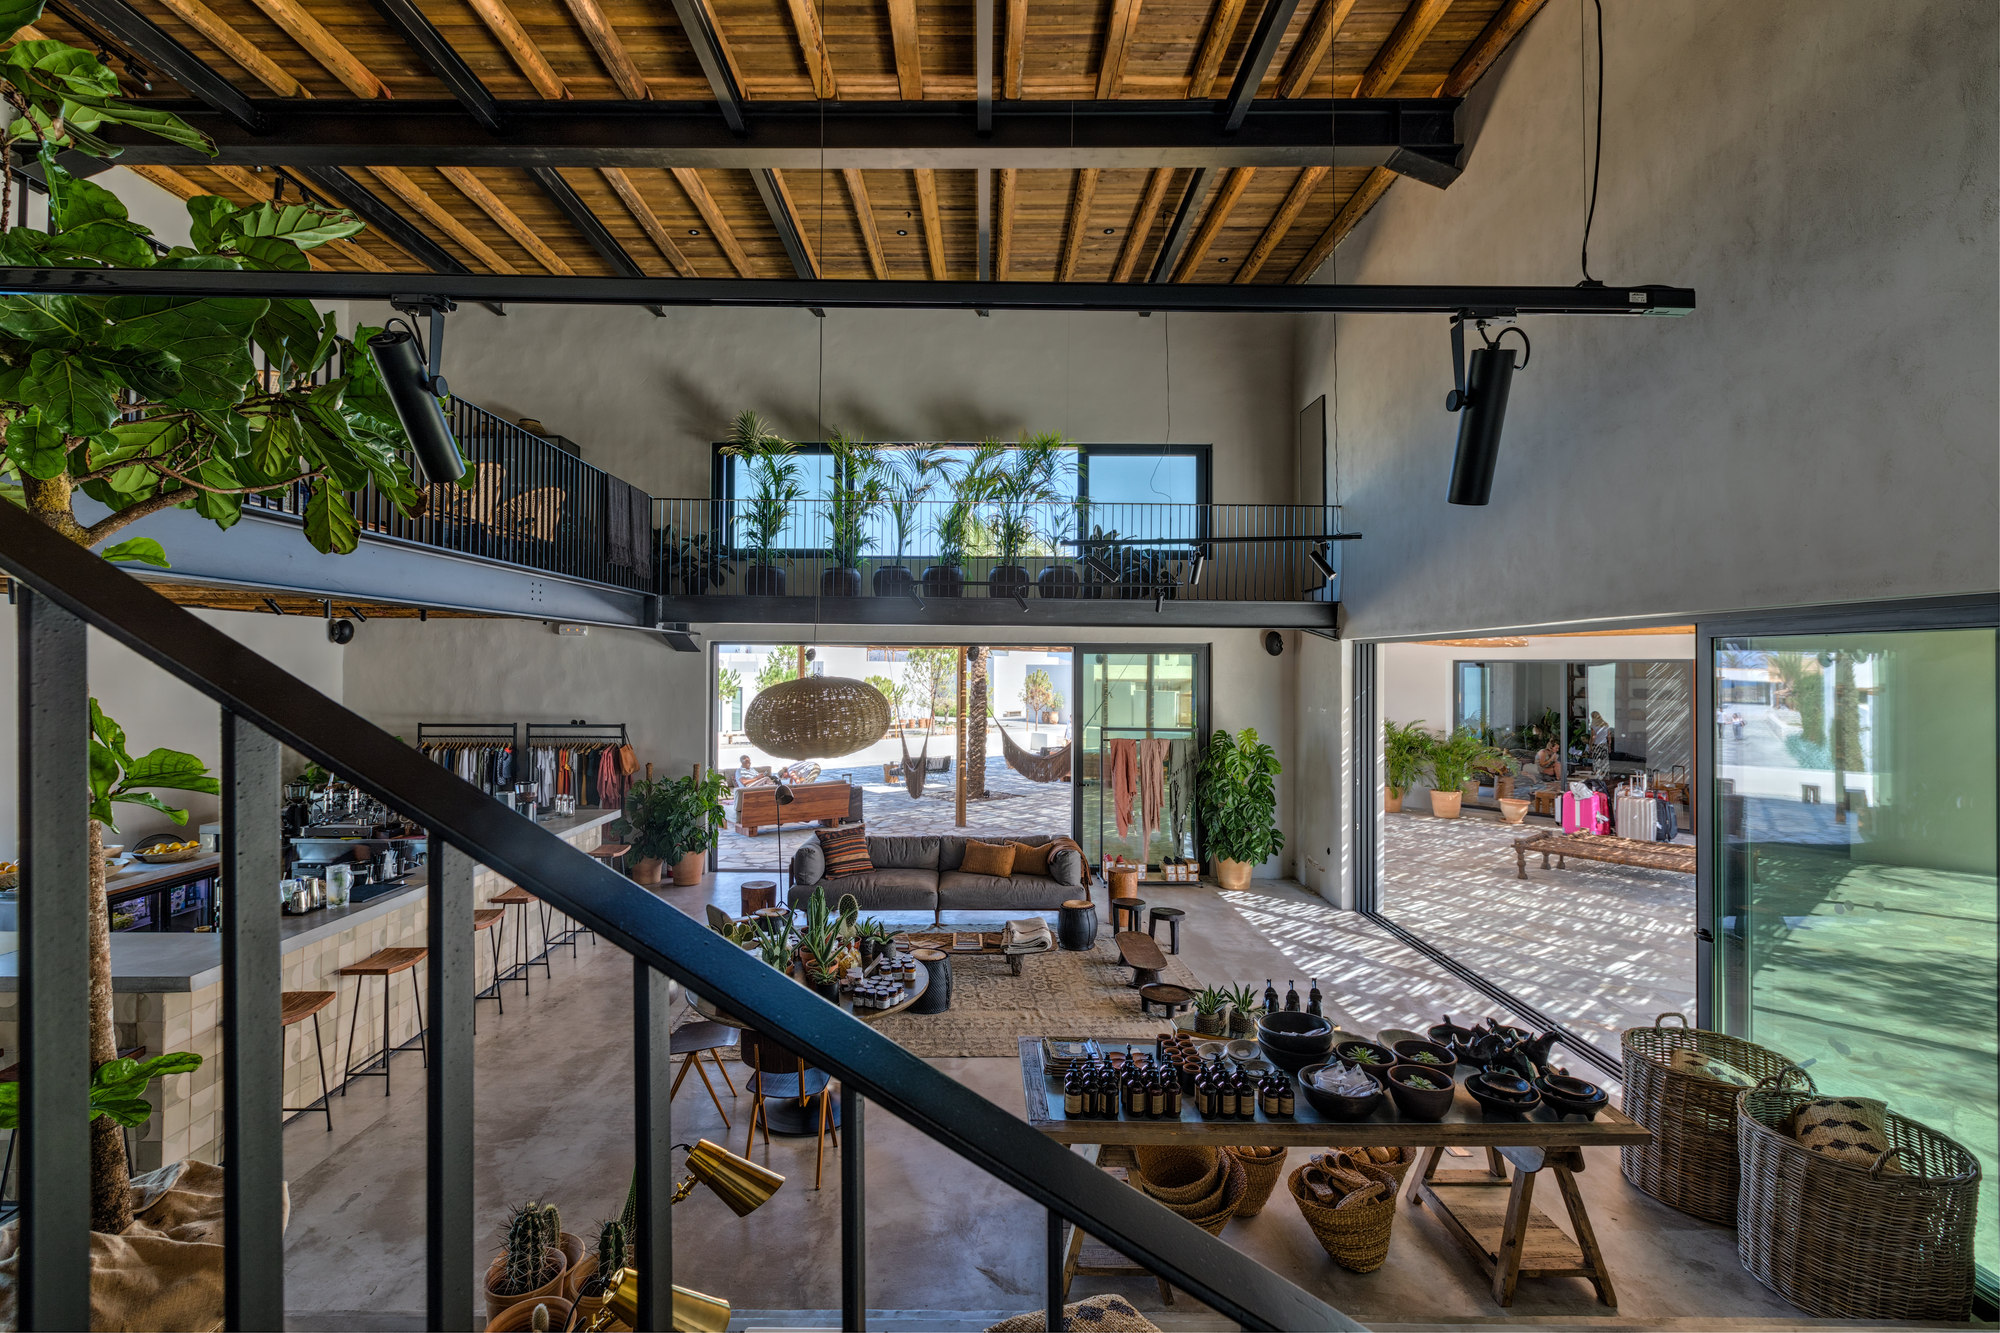 gallery of casa cook kos hotel mastrominas architecture 23. Black Bedroom Furniture Sets. Home Design Ideas